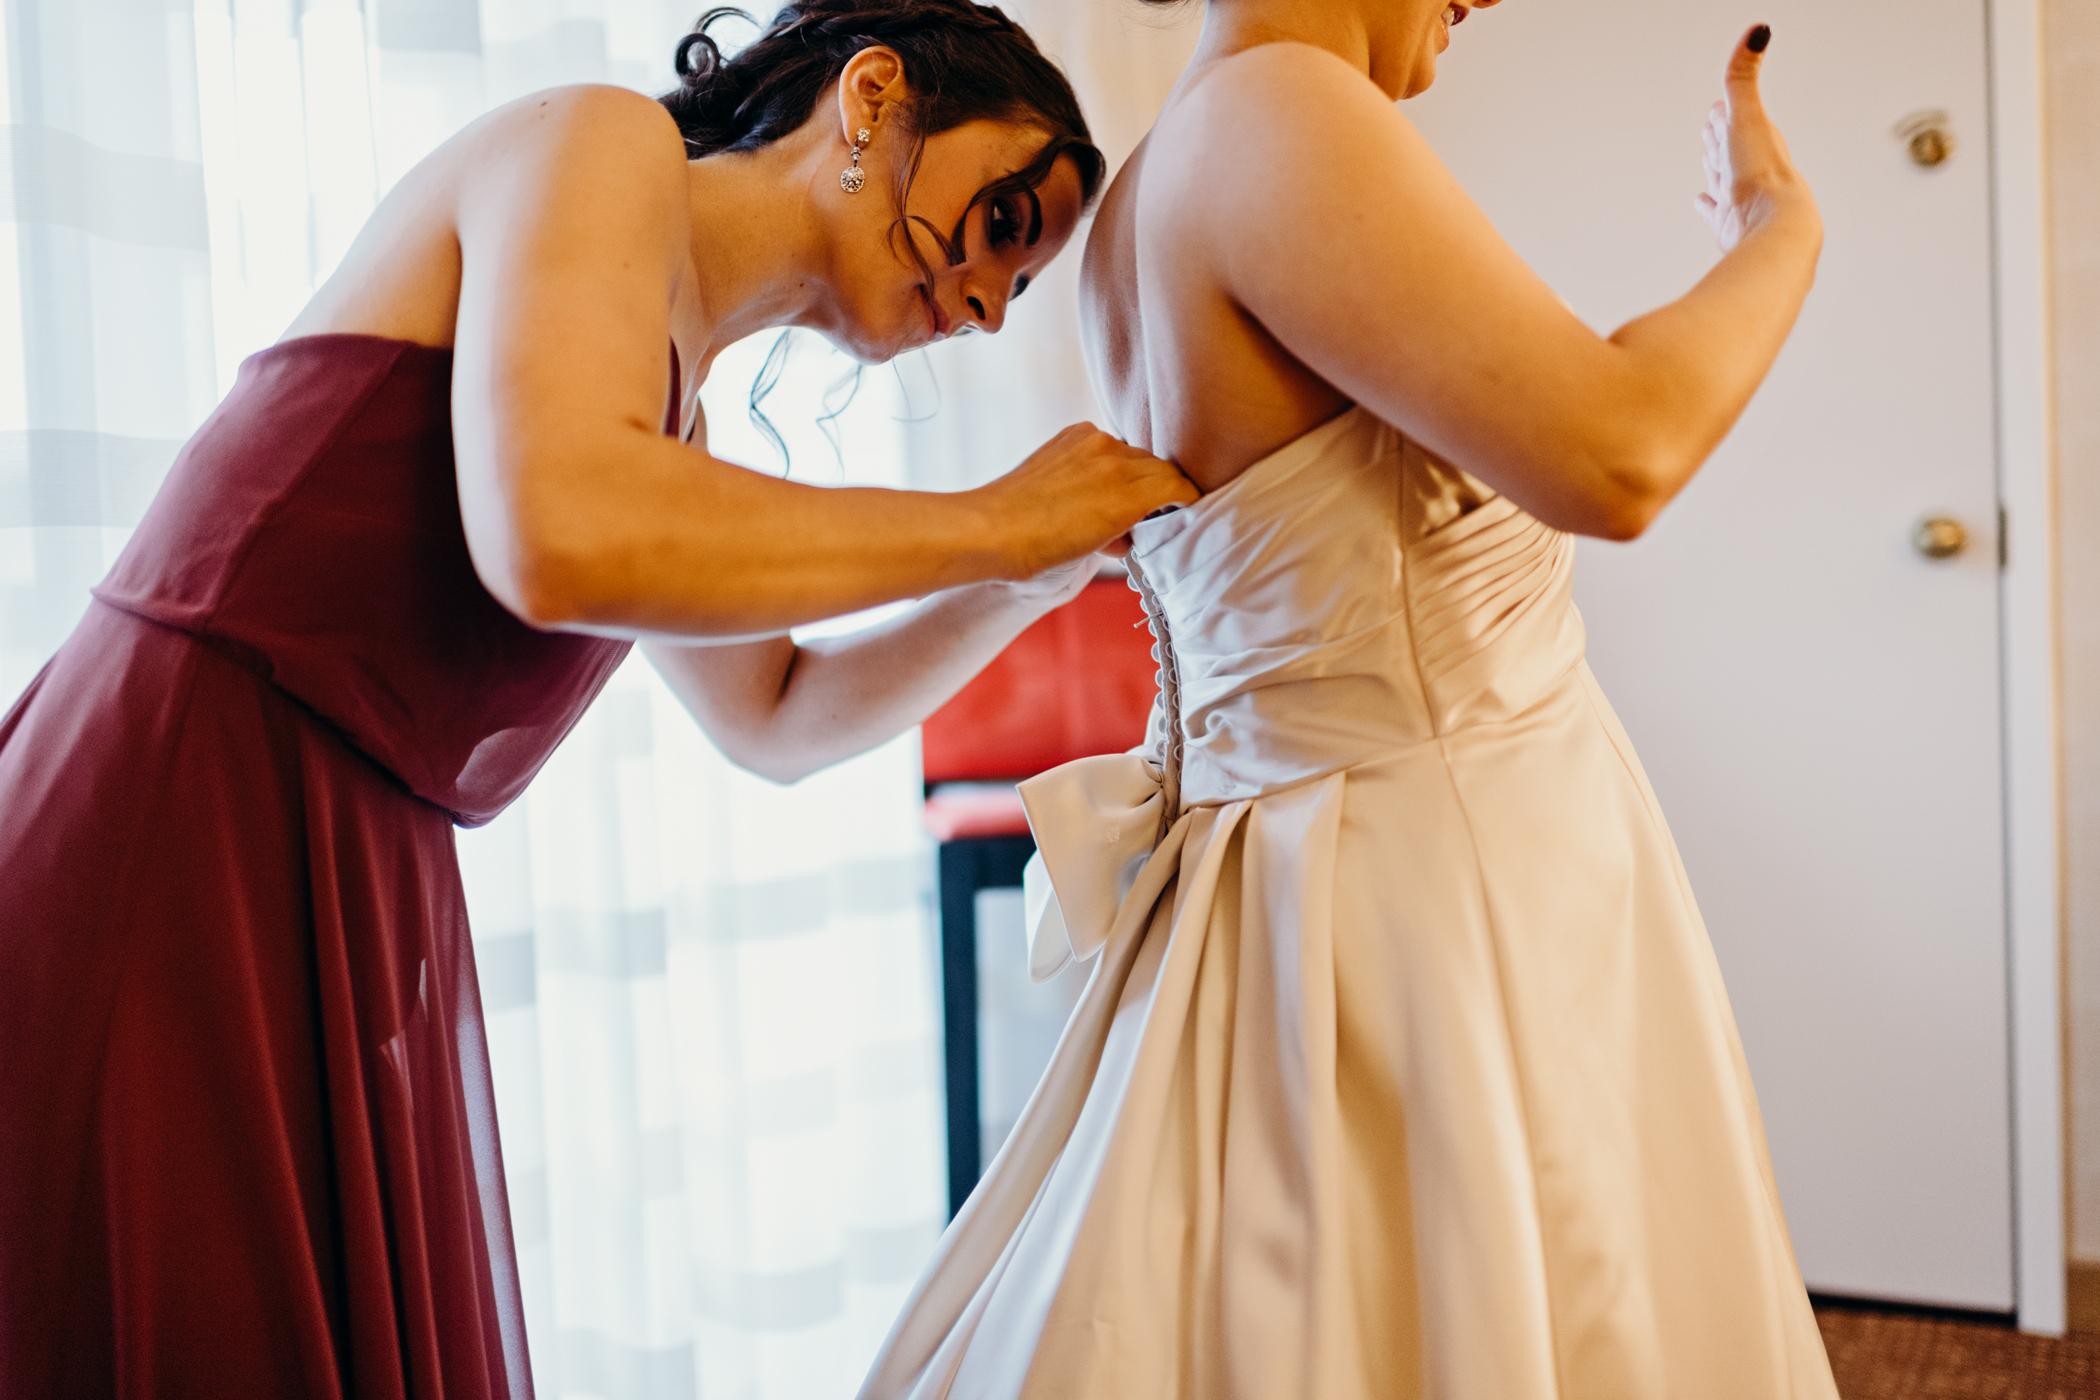 Bridesmaid fastens bride's wedding gown